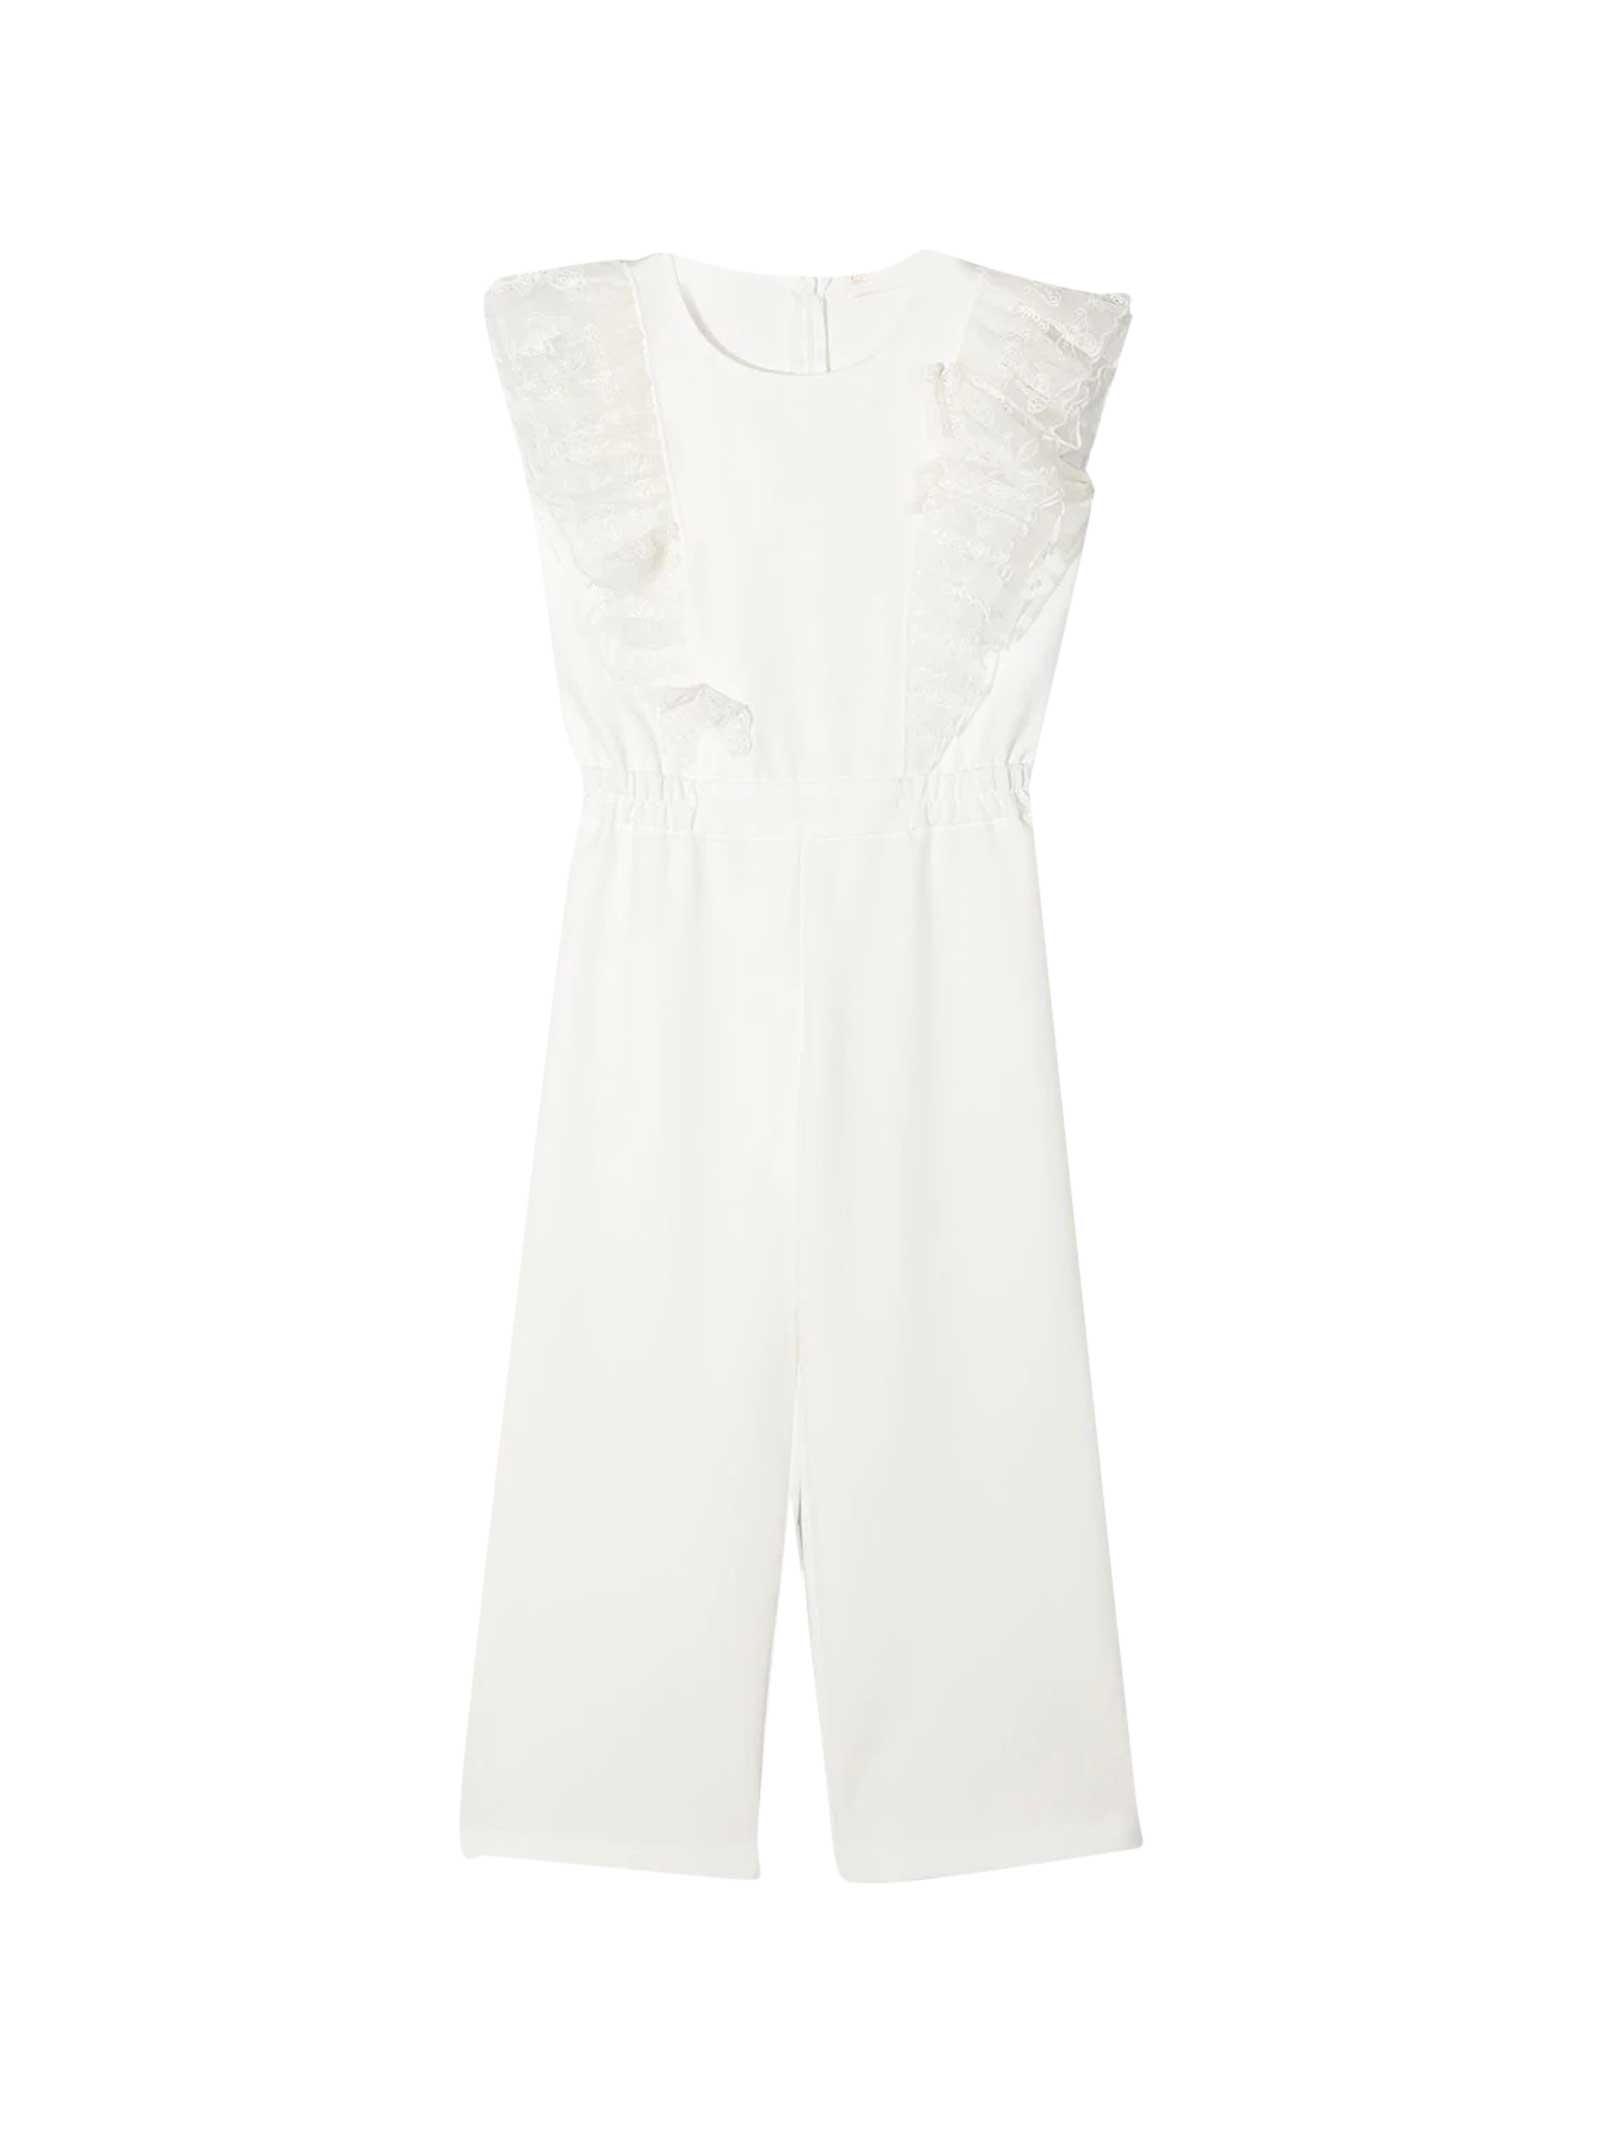 Monnalisa Monnalisa White Suit